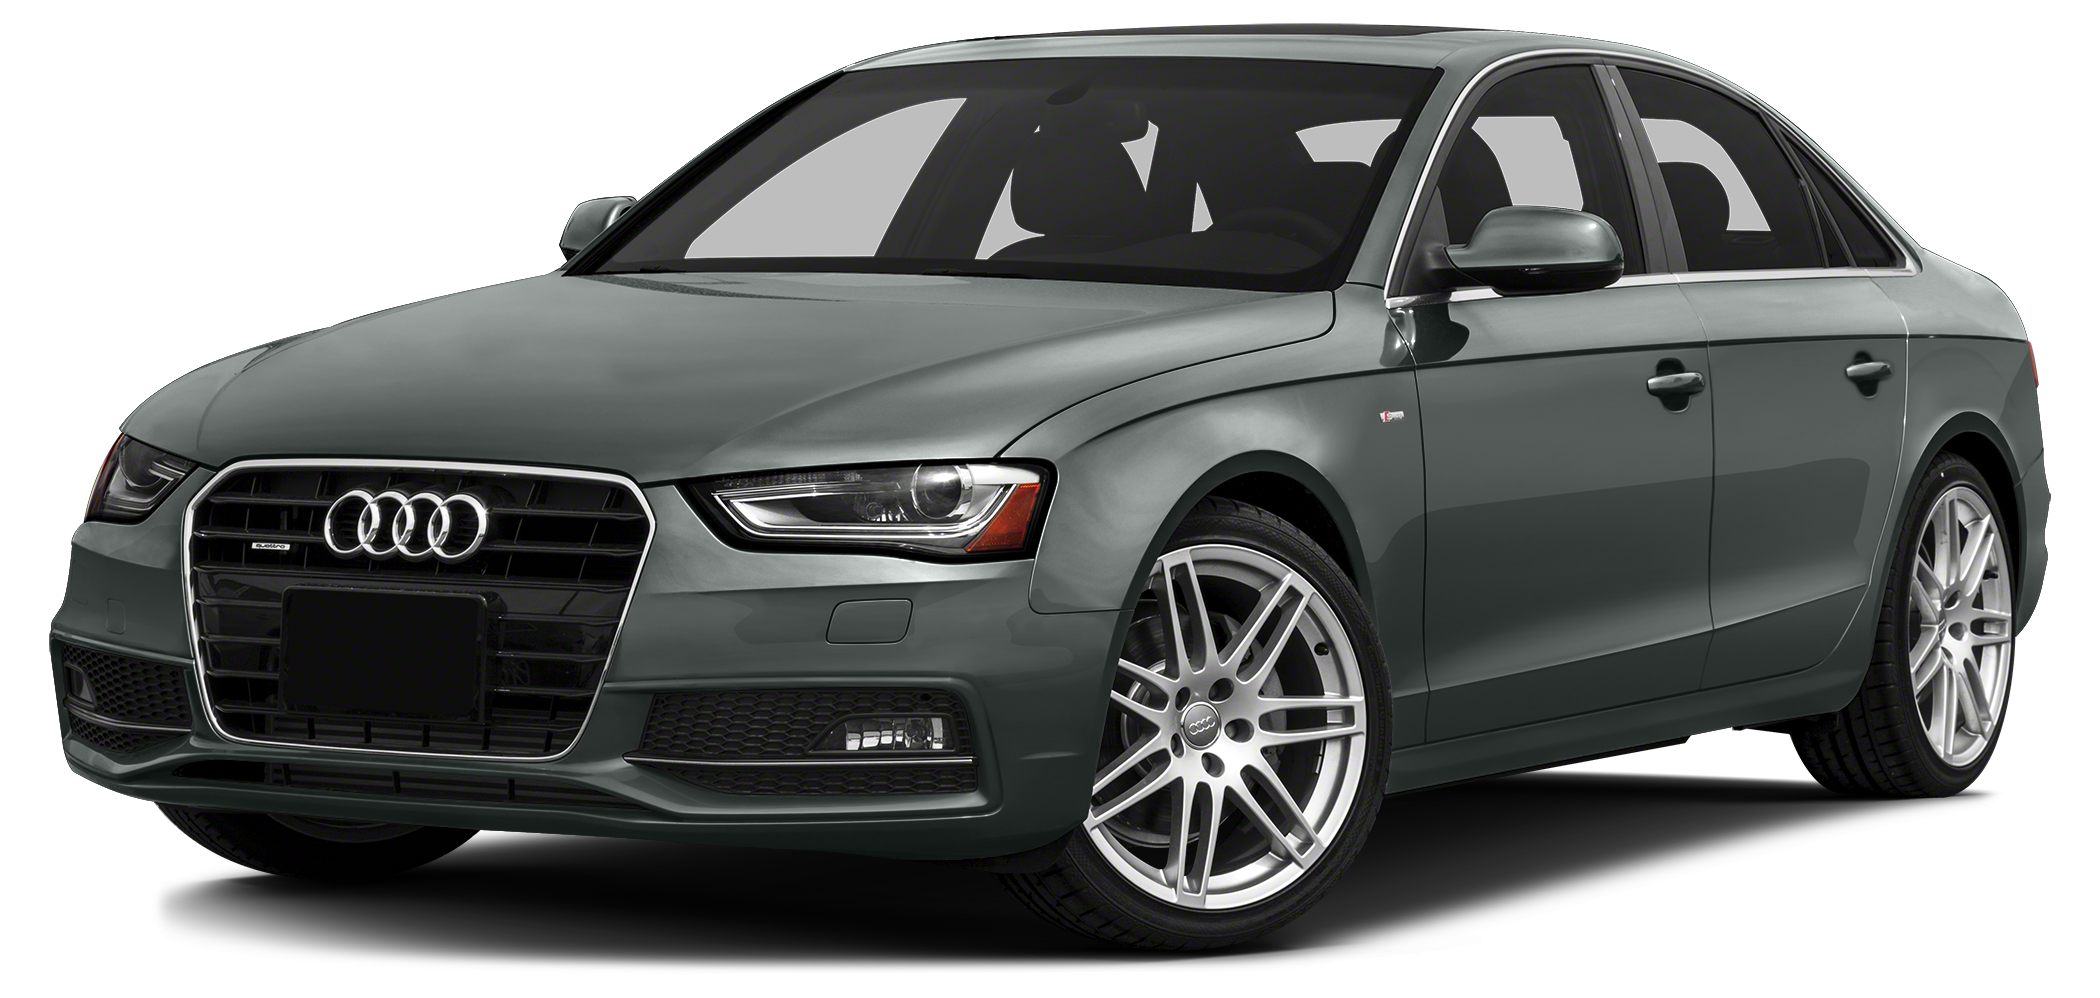 2013 Audi A4 20T Premium Miles 34865Color Monsoon Gray Metallic Stock 038981 VIN WAUAFAFL8D